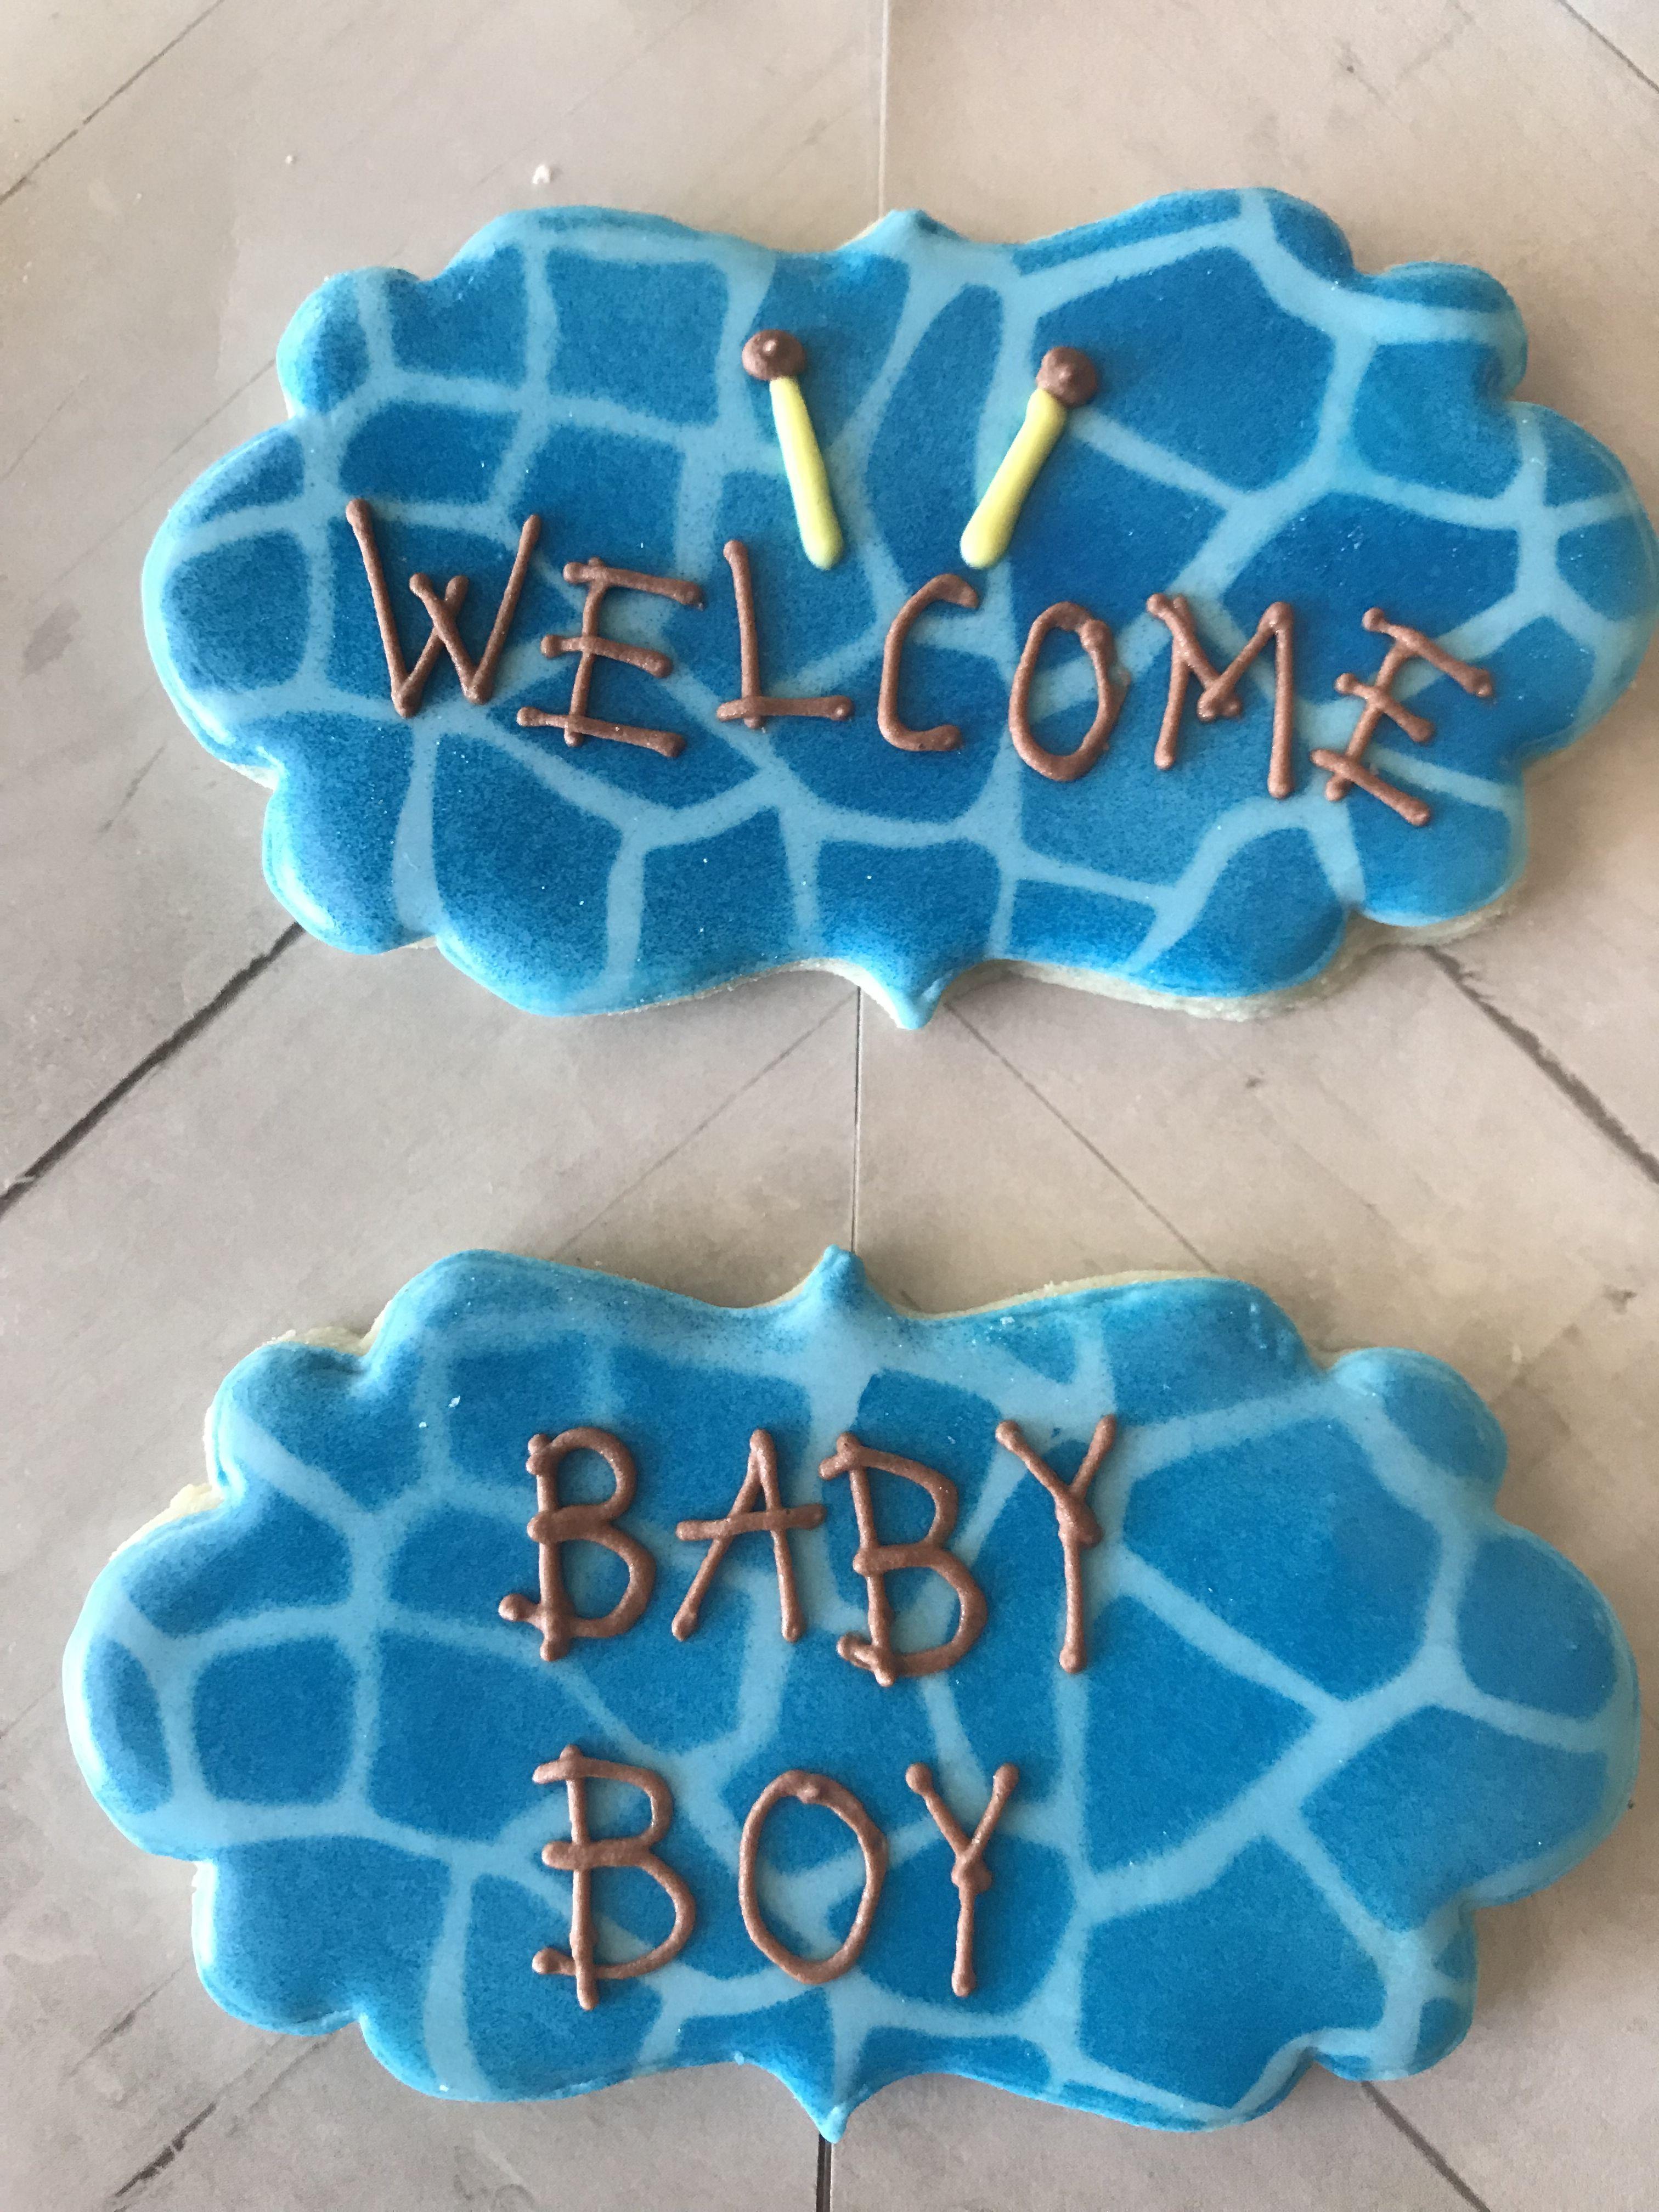 Custom Decorated Sugar Cookies #Cookies #Royalicing #Babyshower